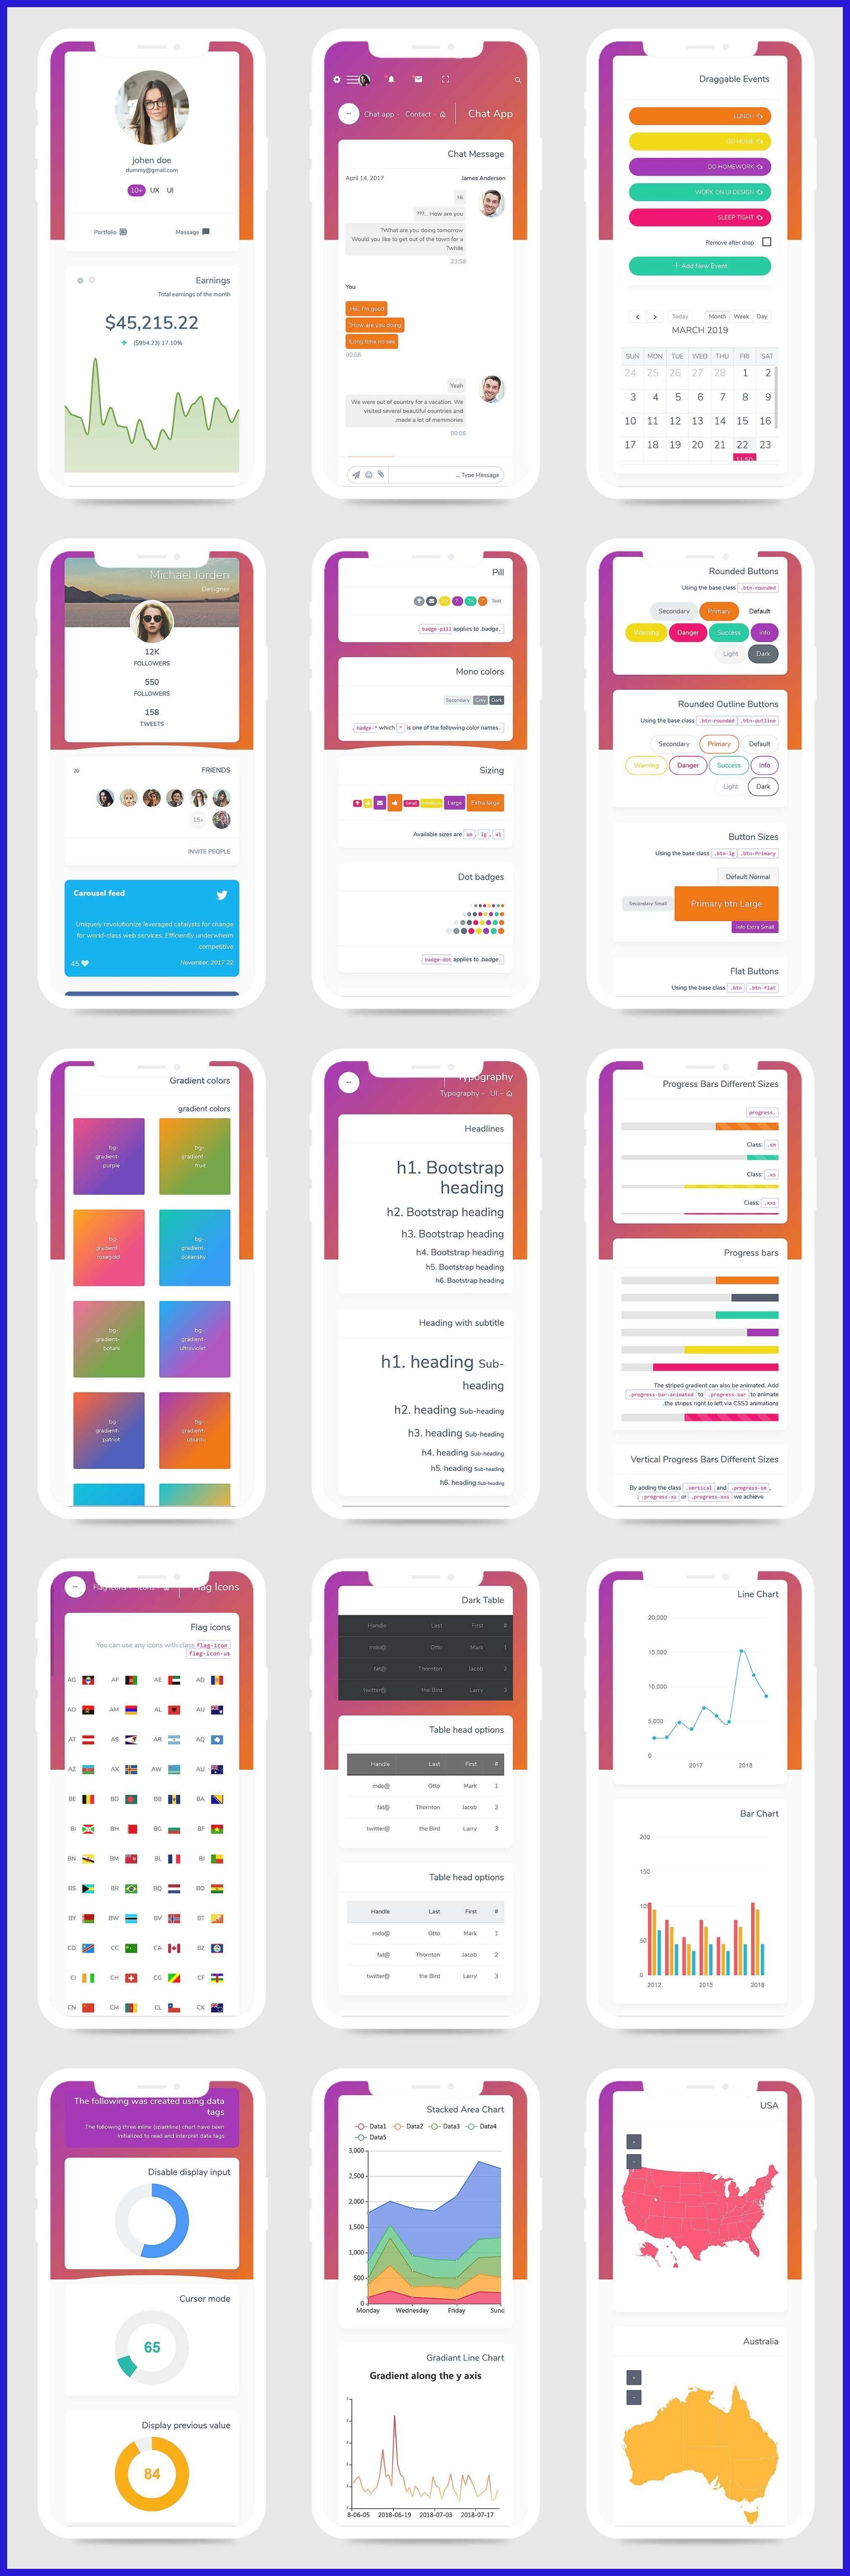 Responsive Web Design Boostrap Crmx Admin Is Fully Responsive Responsive Web Application K In 2020 Dashboard Template Responsive Web Web Application